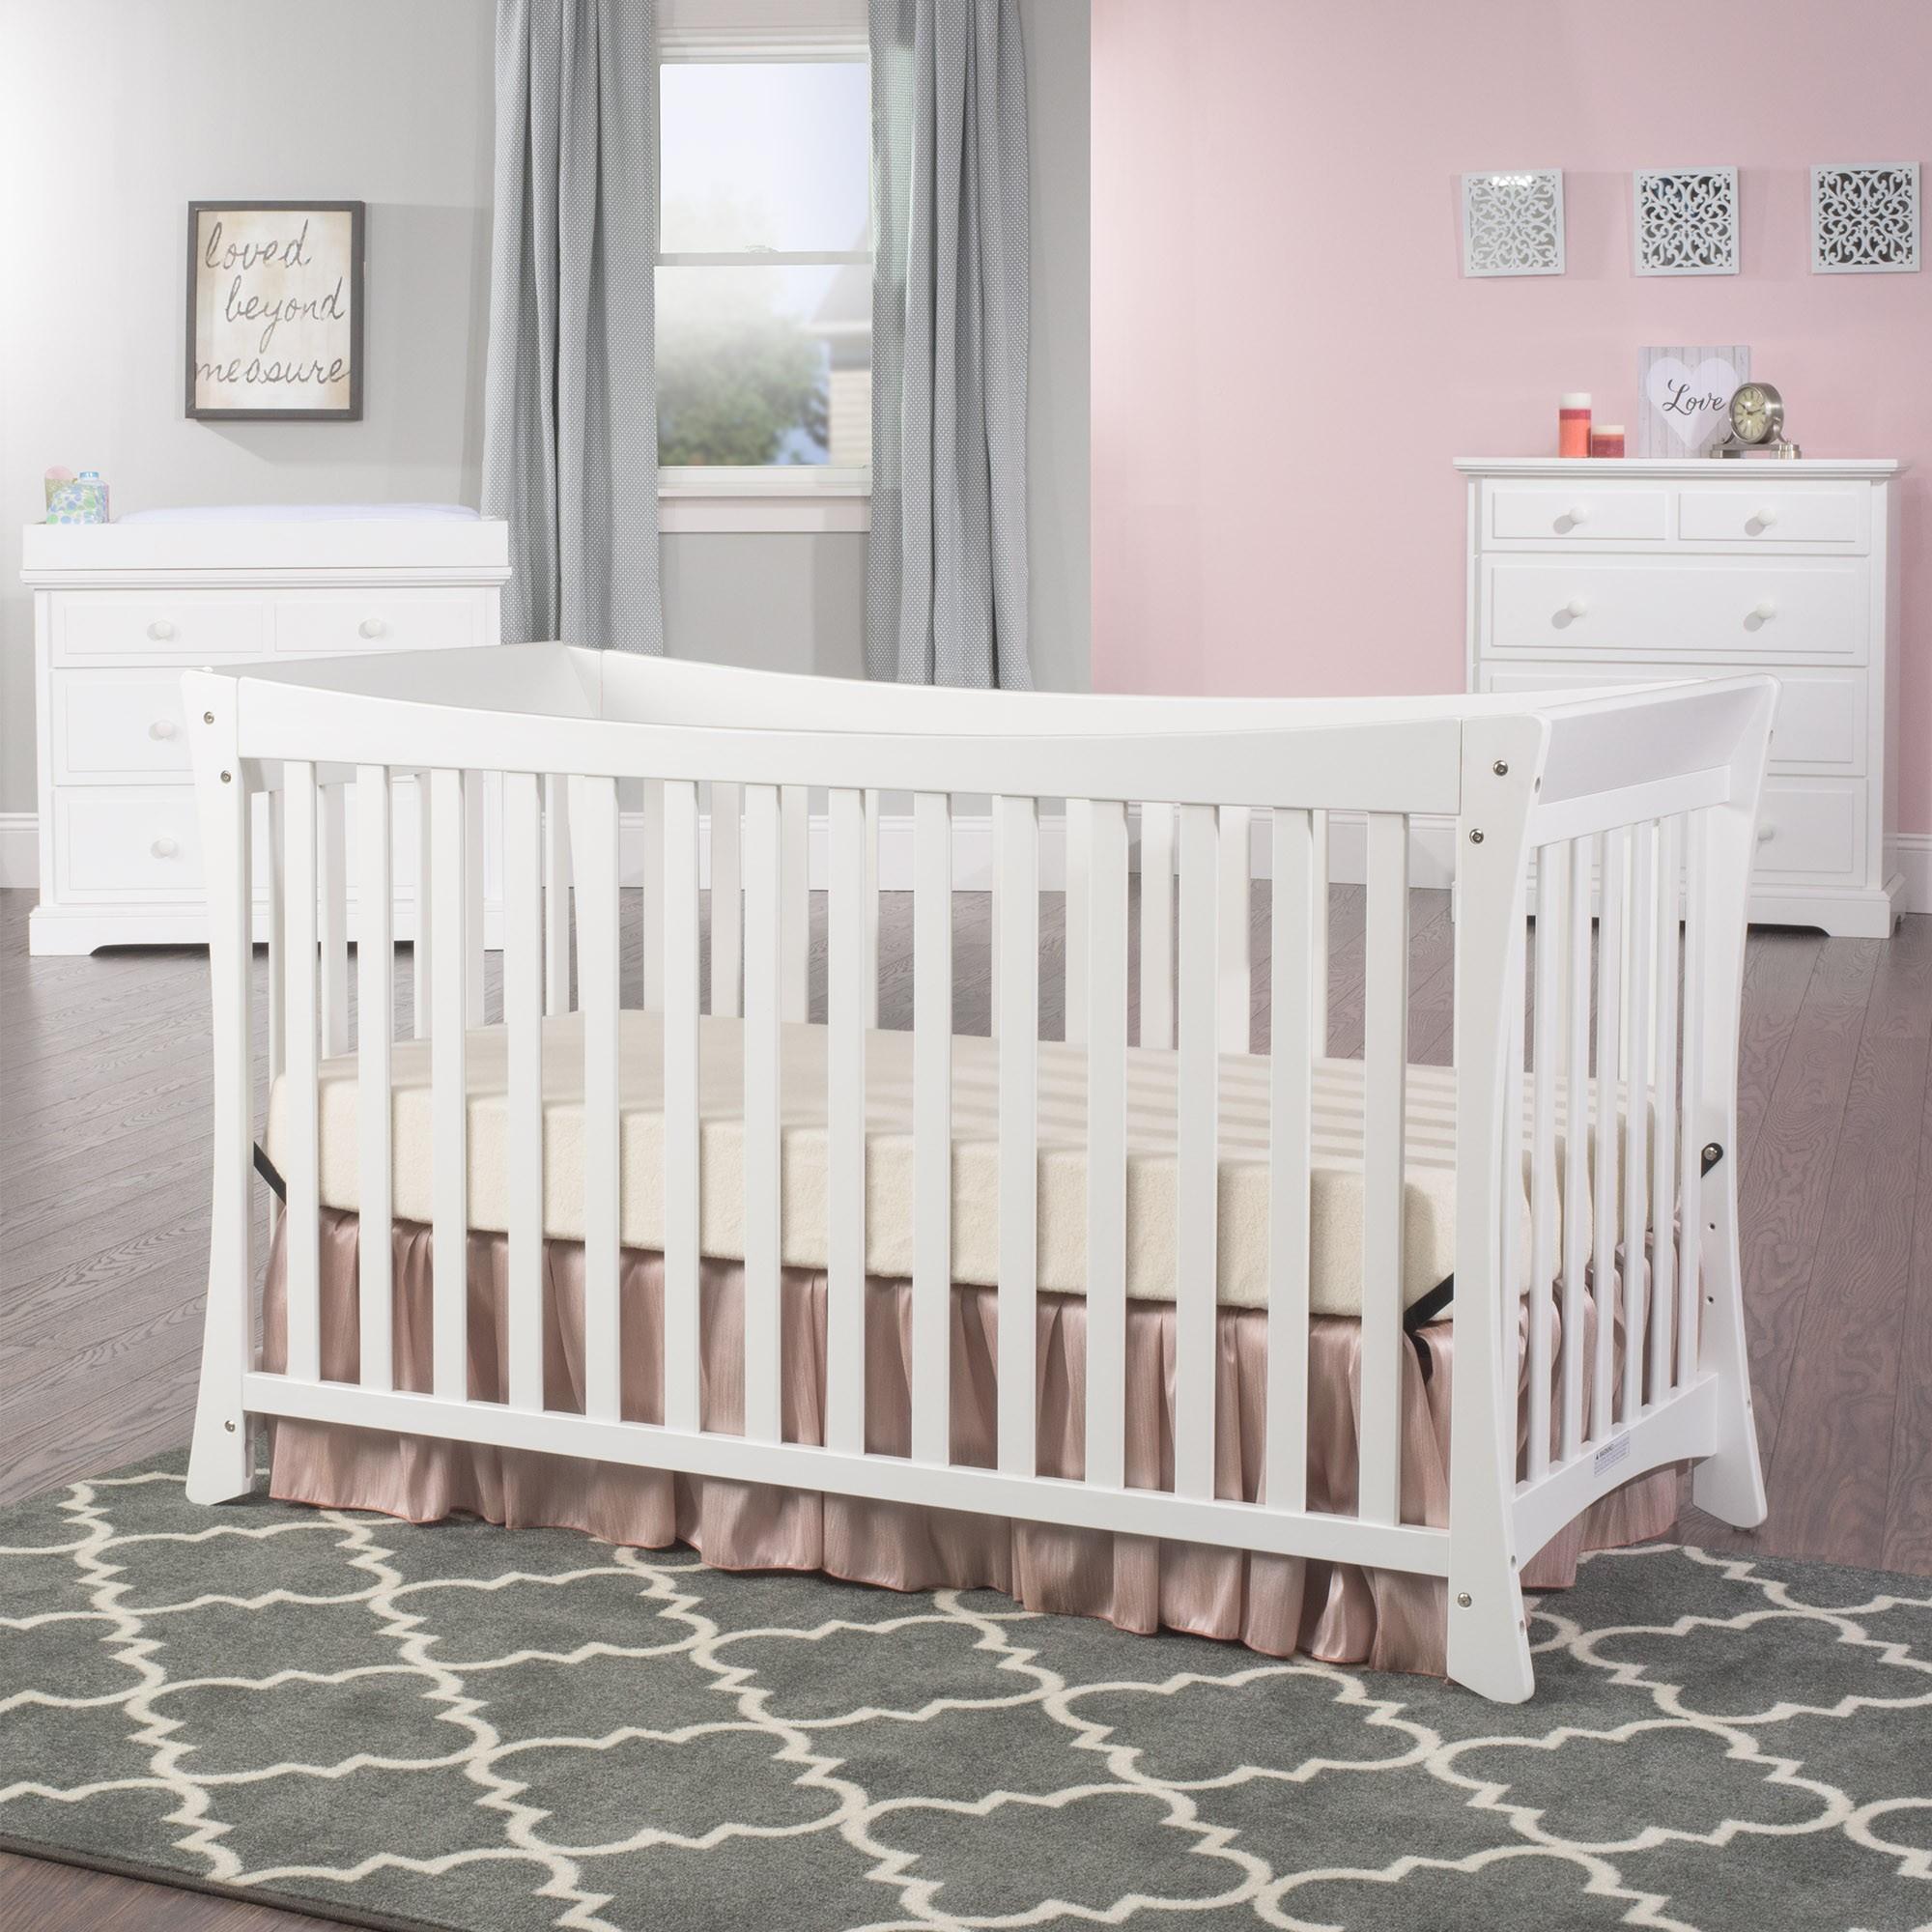 Child craft coventry crib - 8